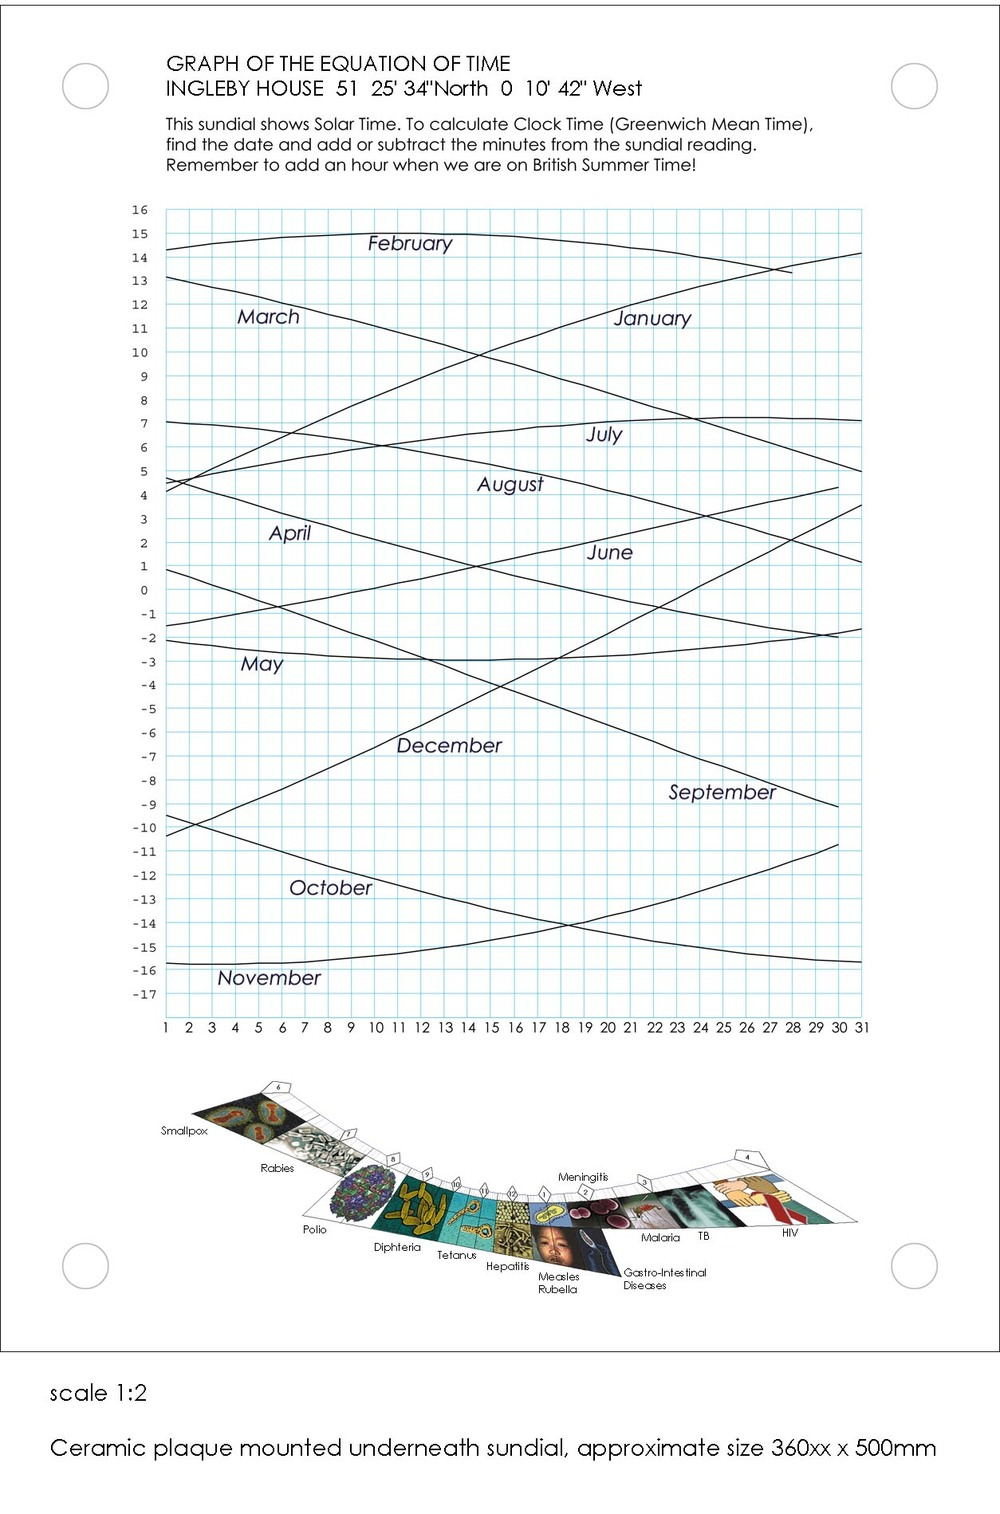 equation of time ingleby house printout web.jpg